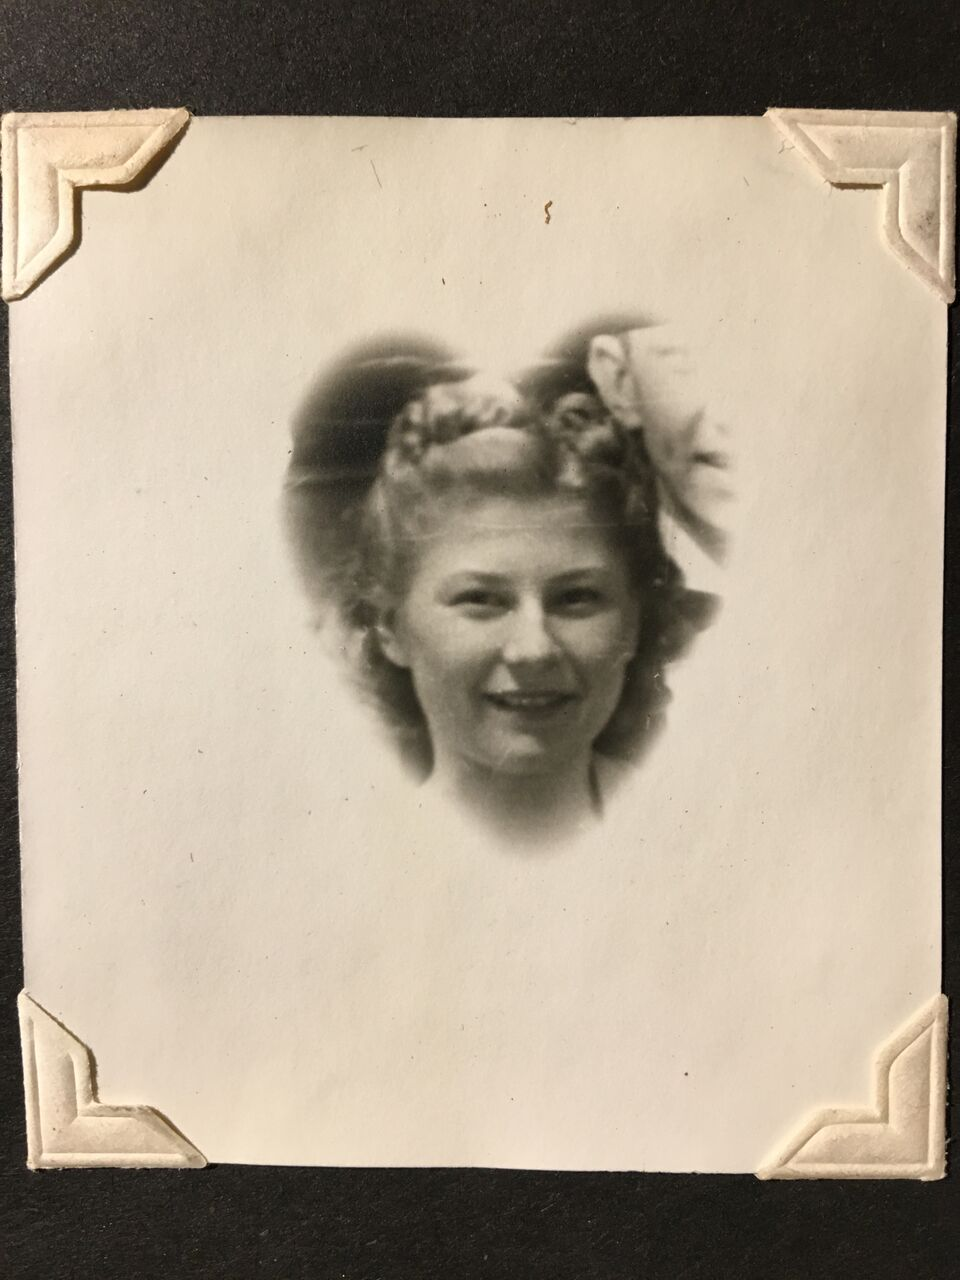 feb 2 1940 heart